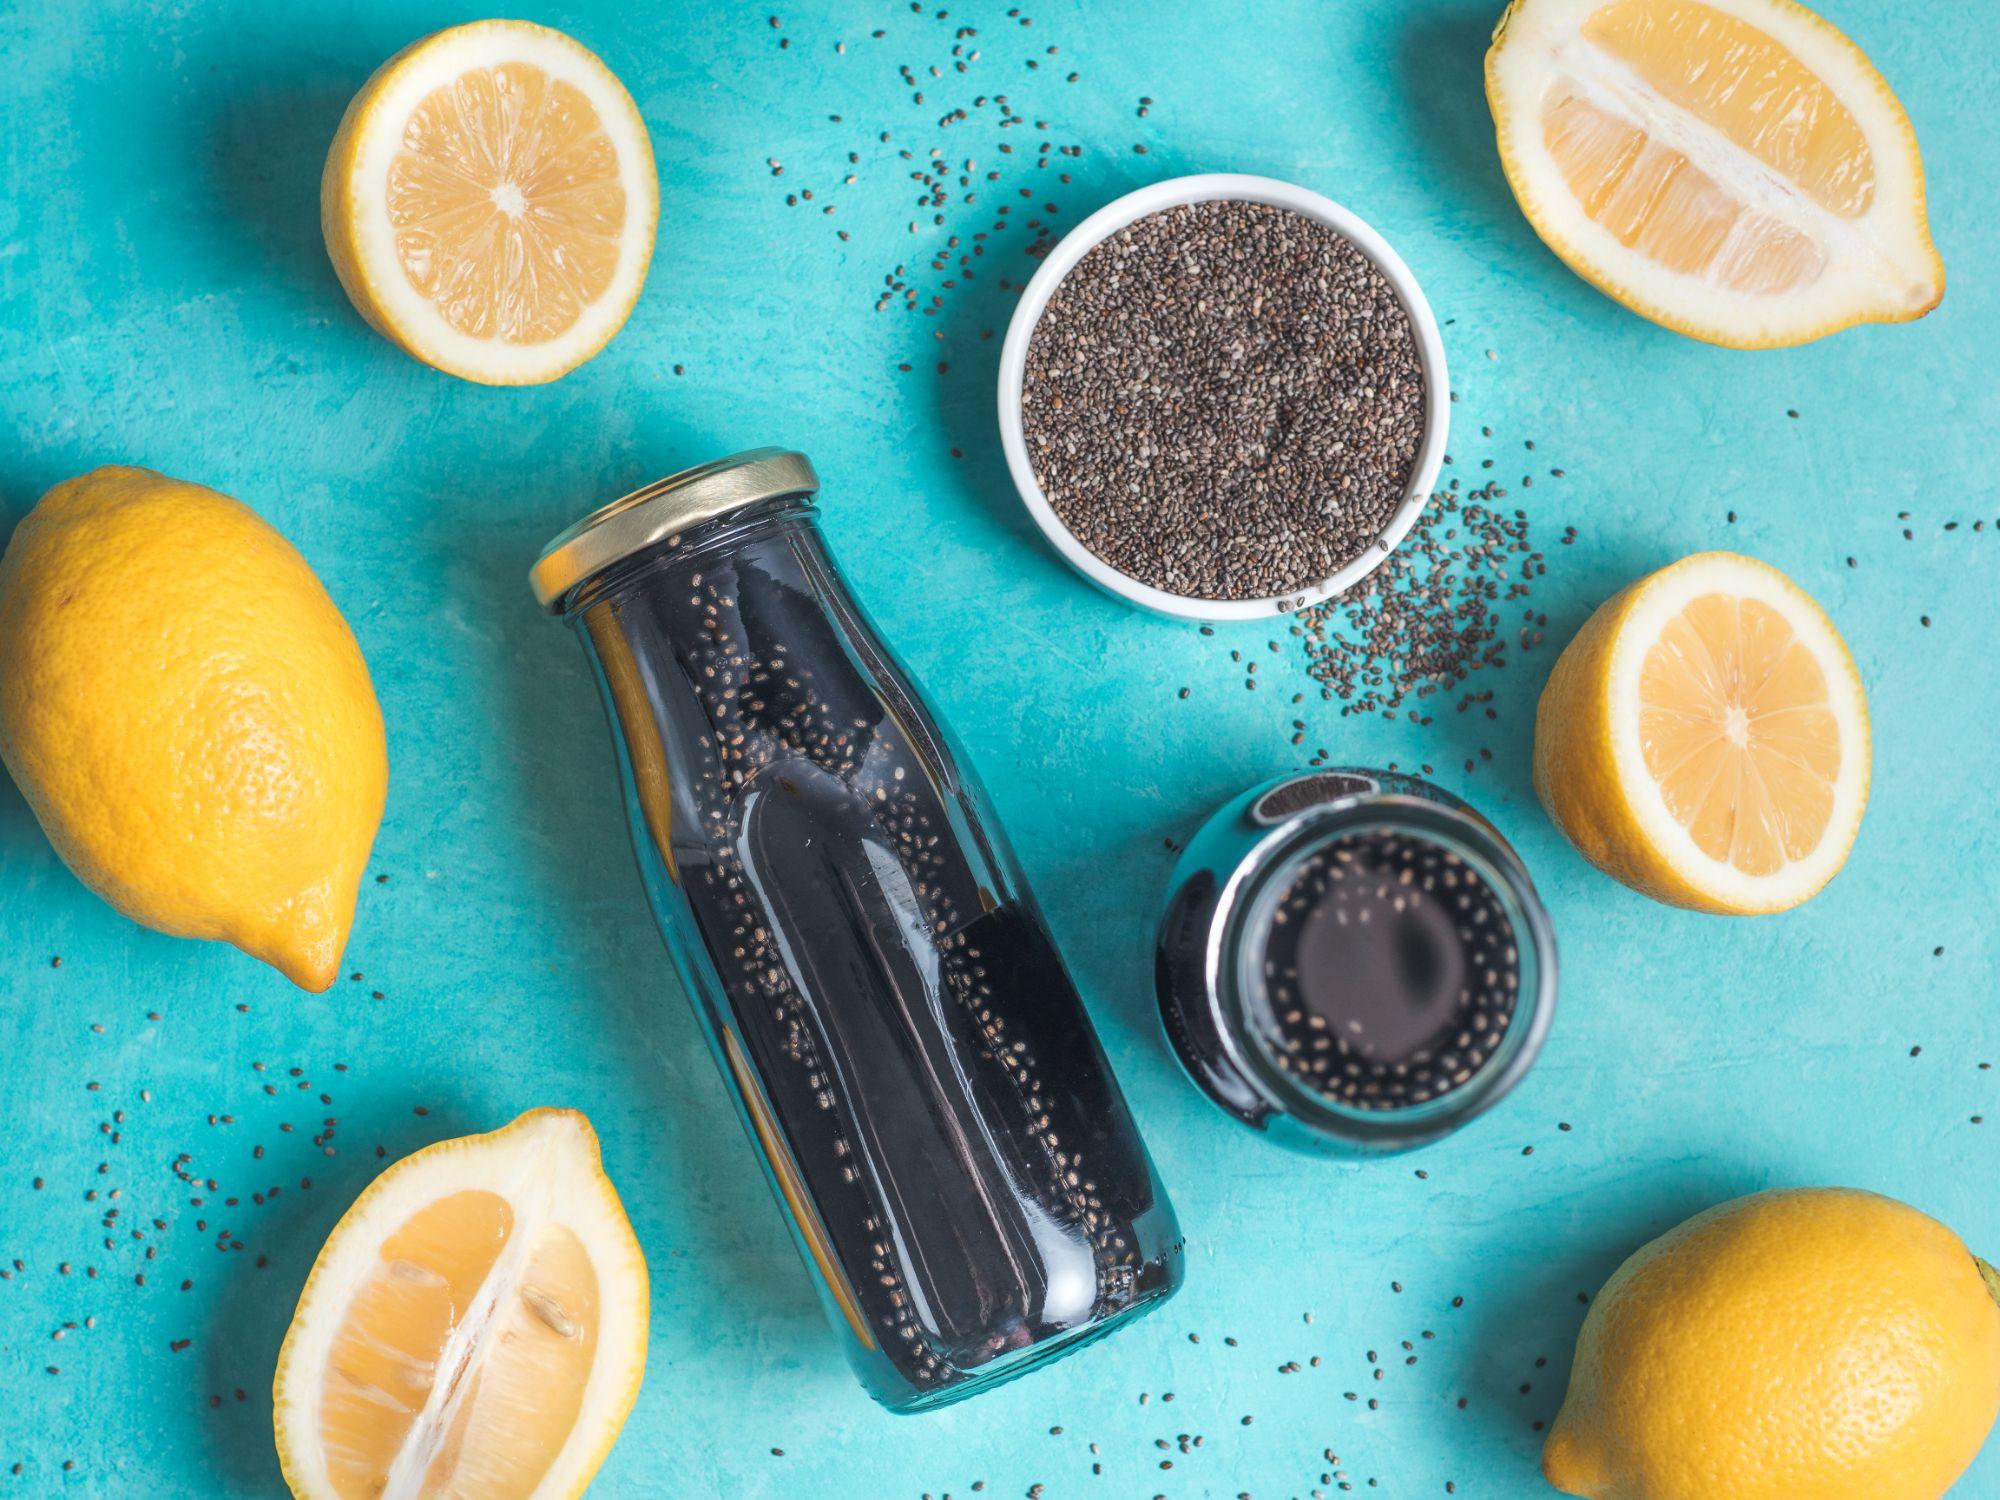 Detox-activated-charcoal-black-chia-lemon-water-959906318_4608x3456